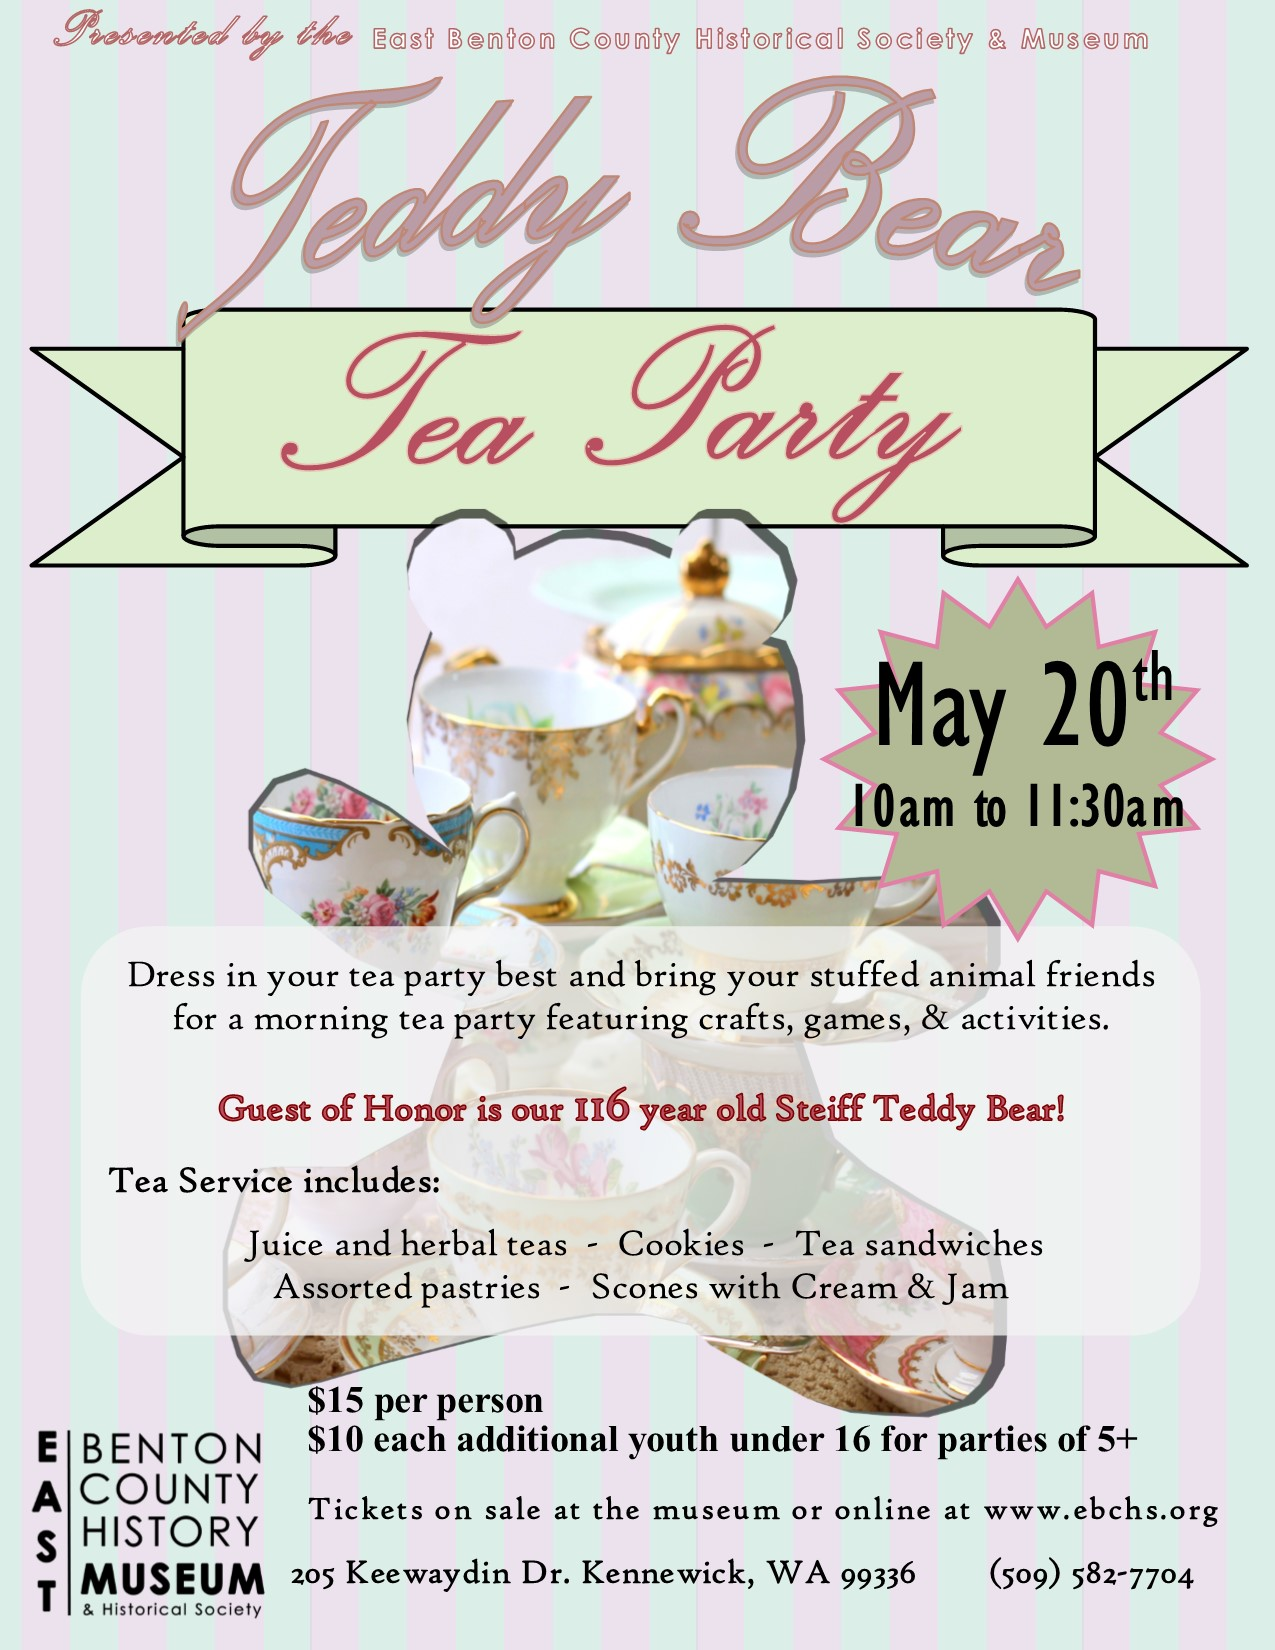 Teddy Bear Tea Party Flyer